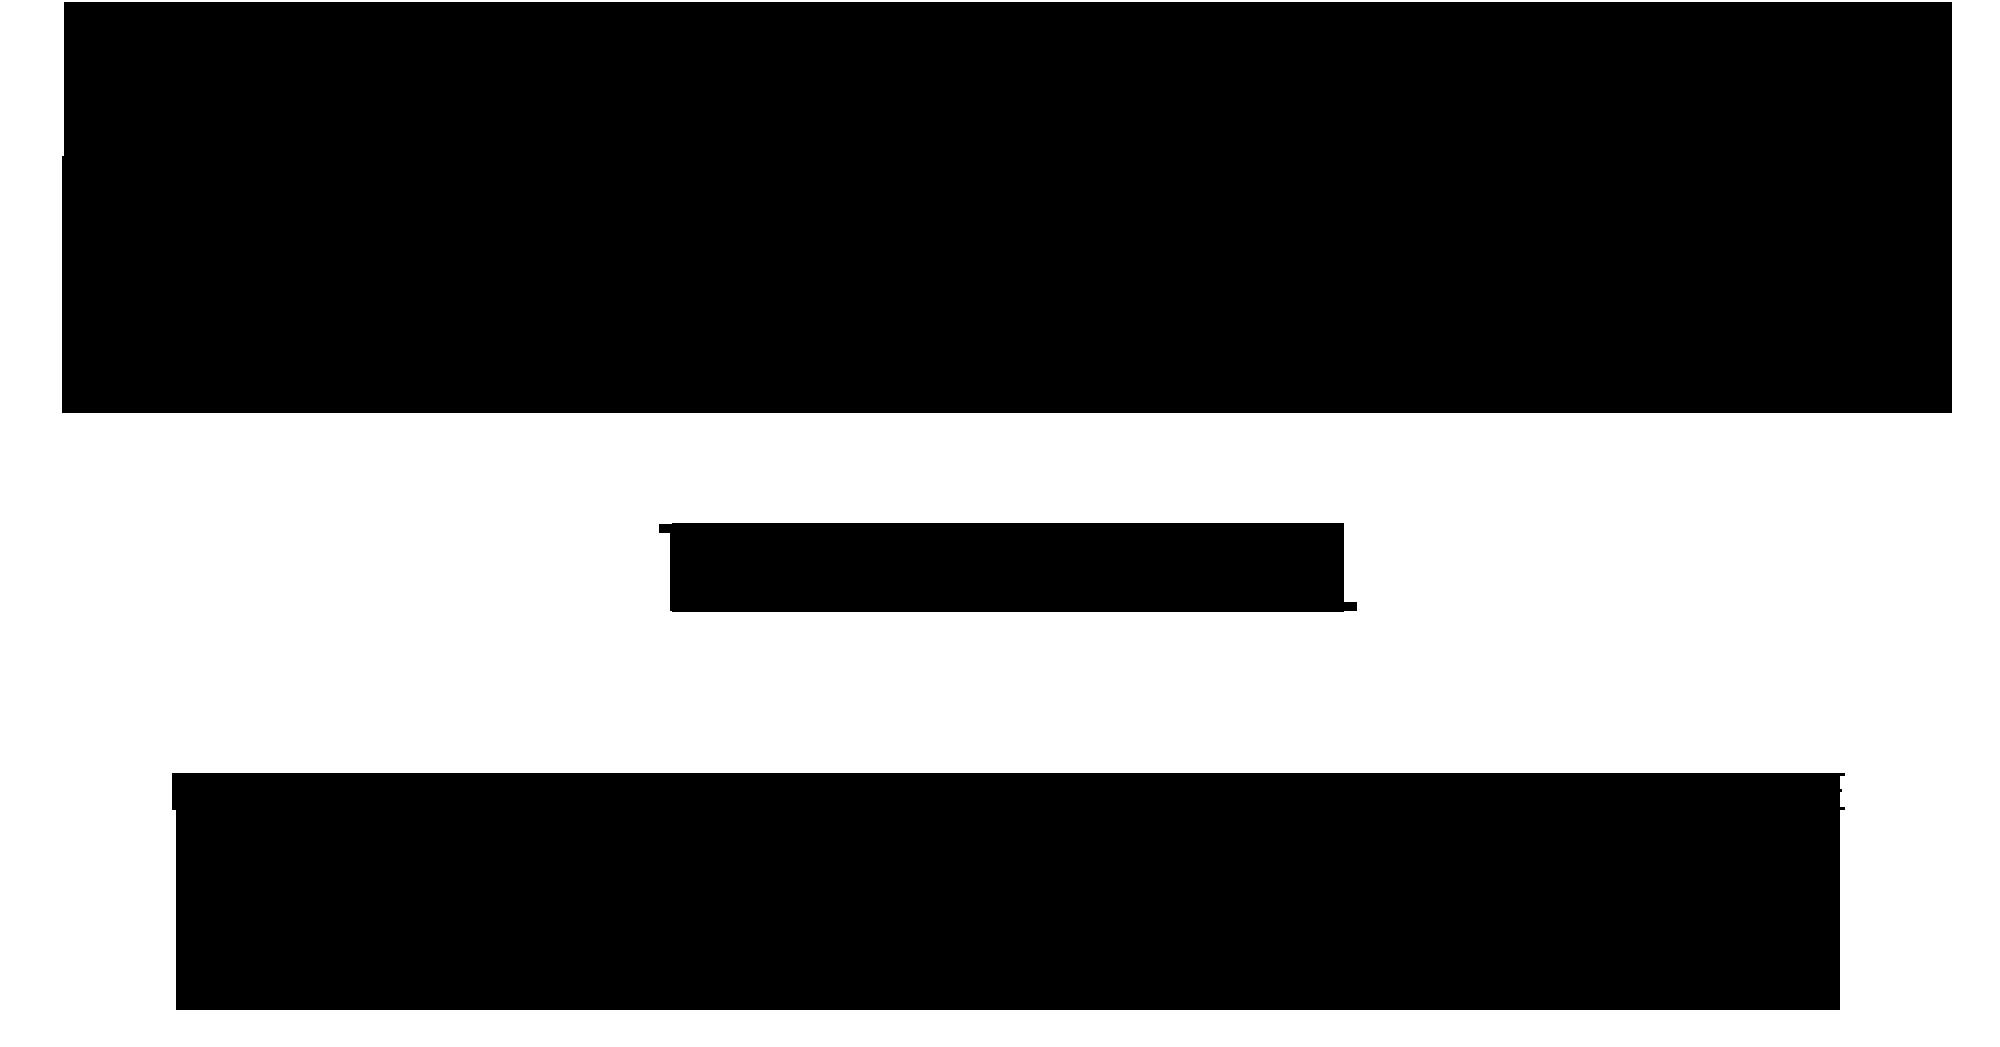 logo block 2.png